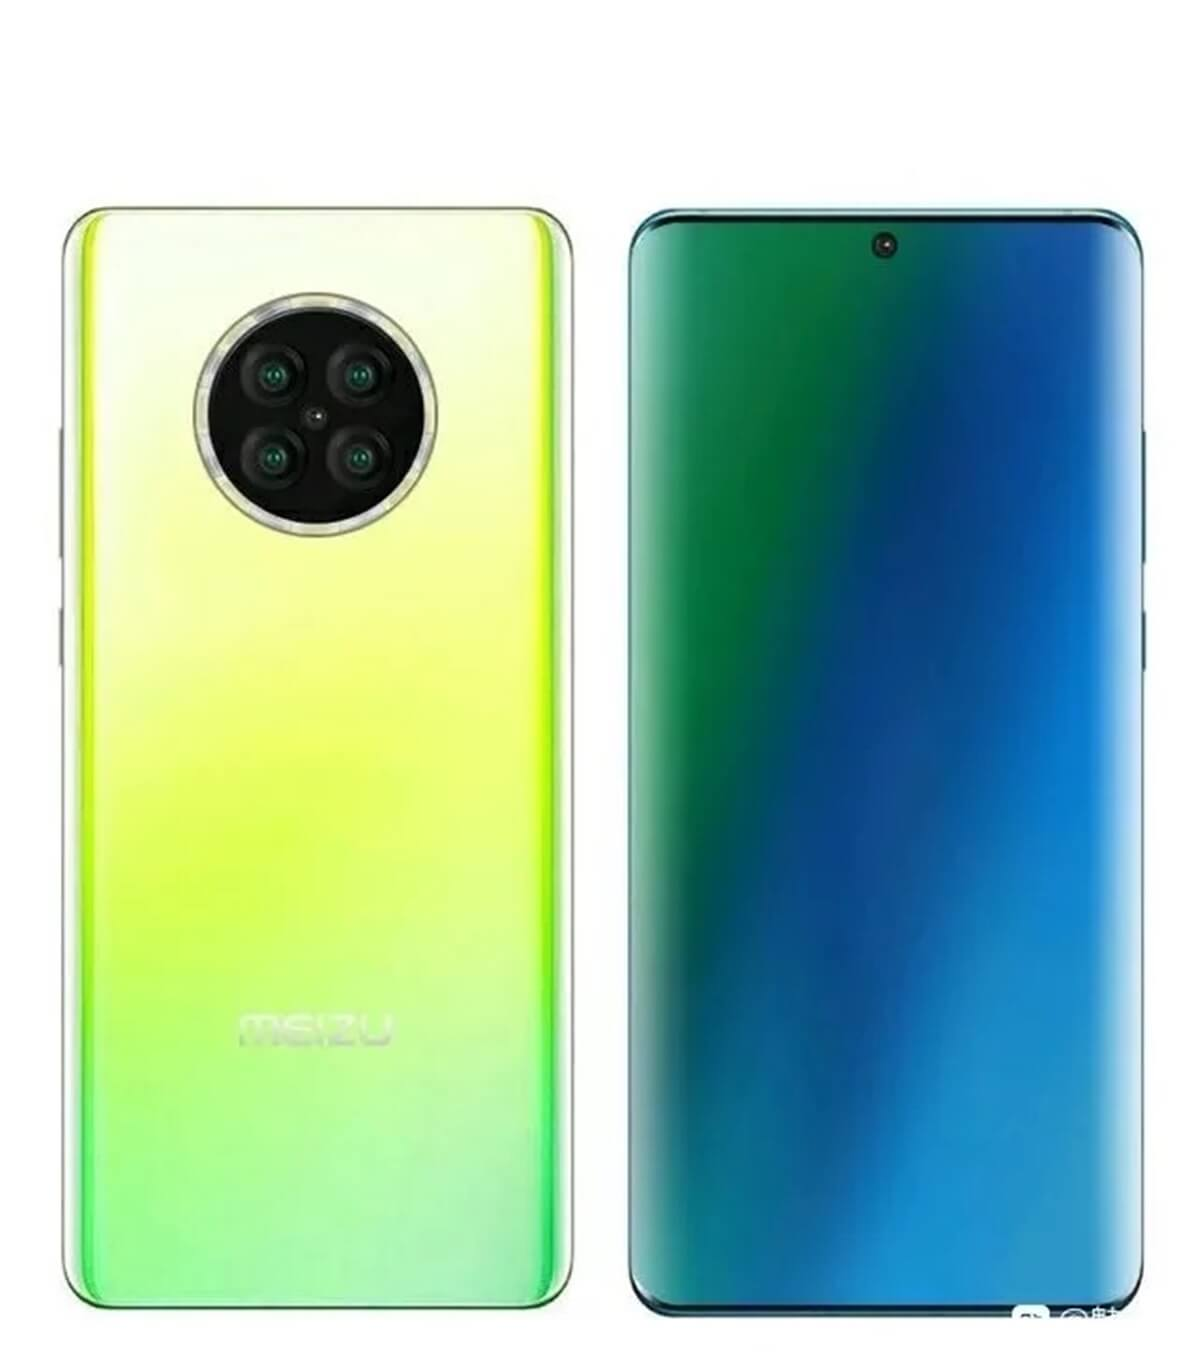 Внешний вид смартфона Meizu 17